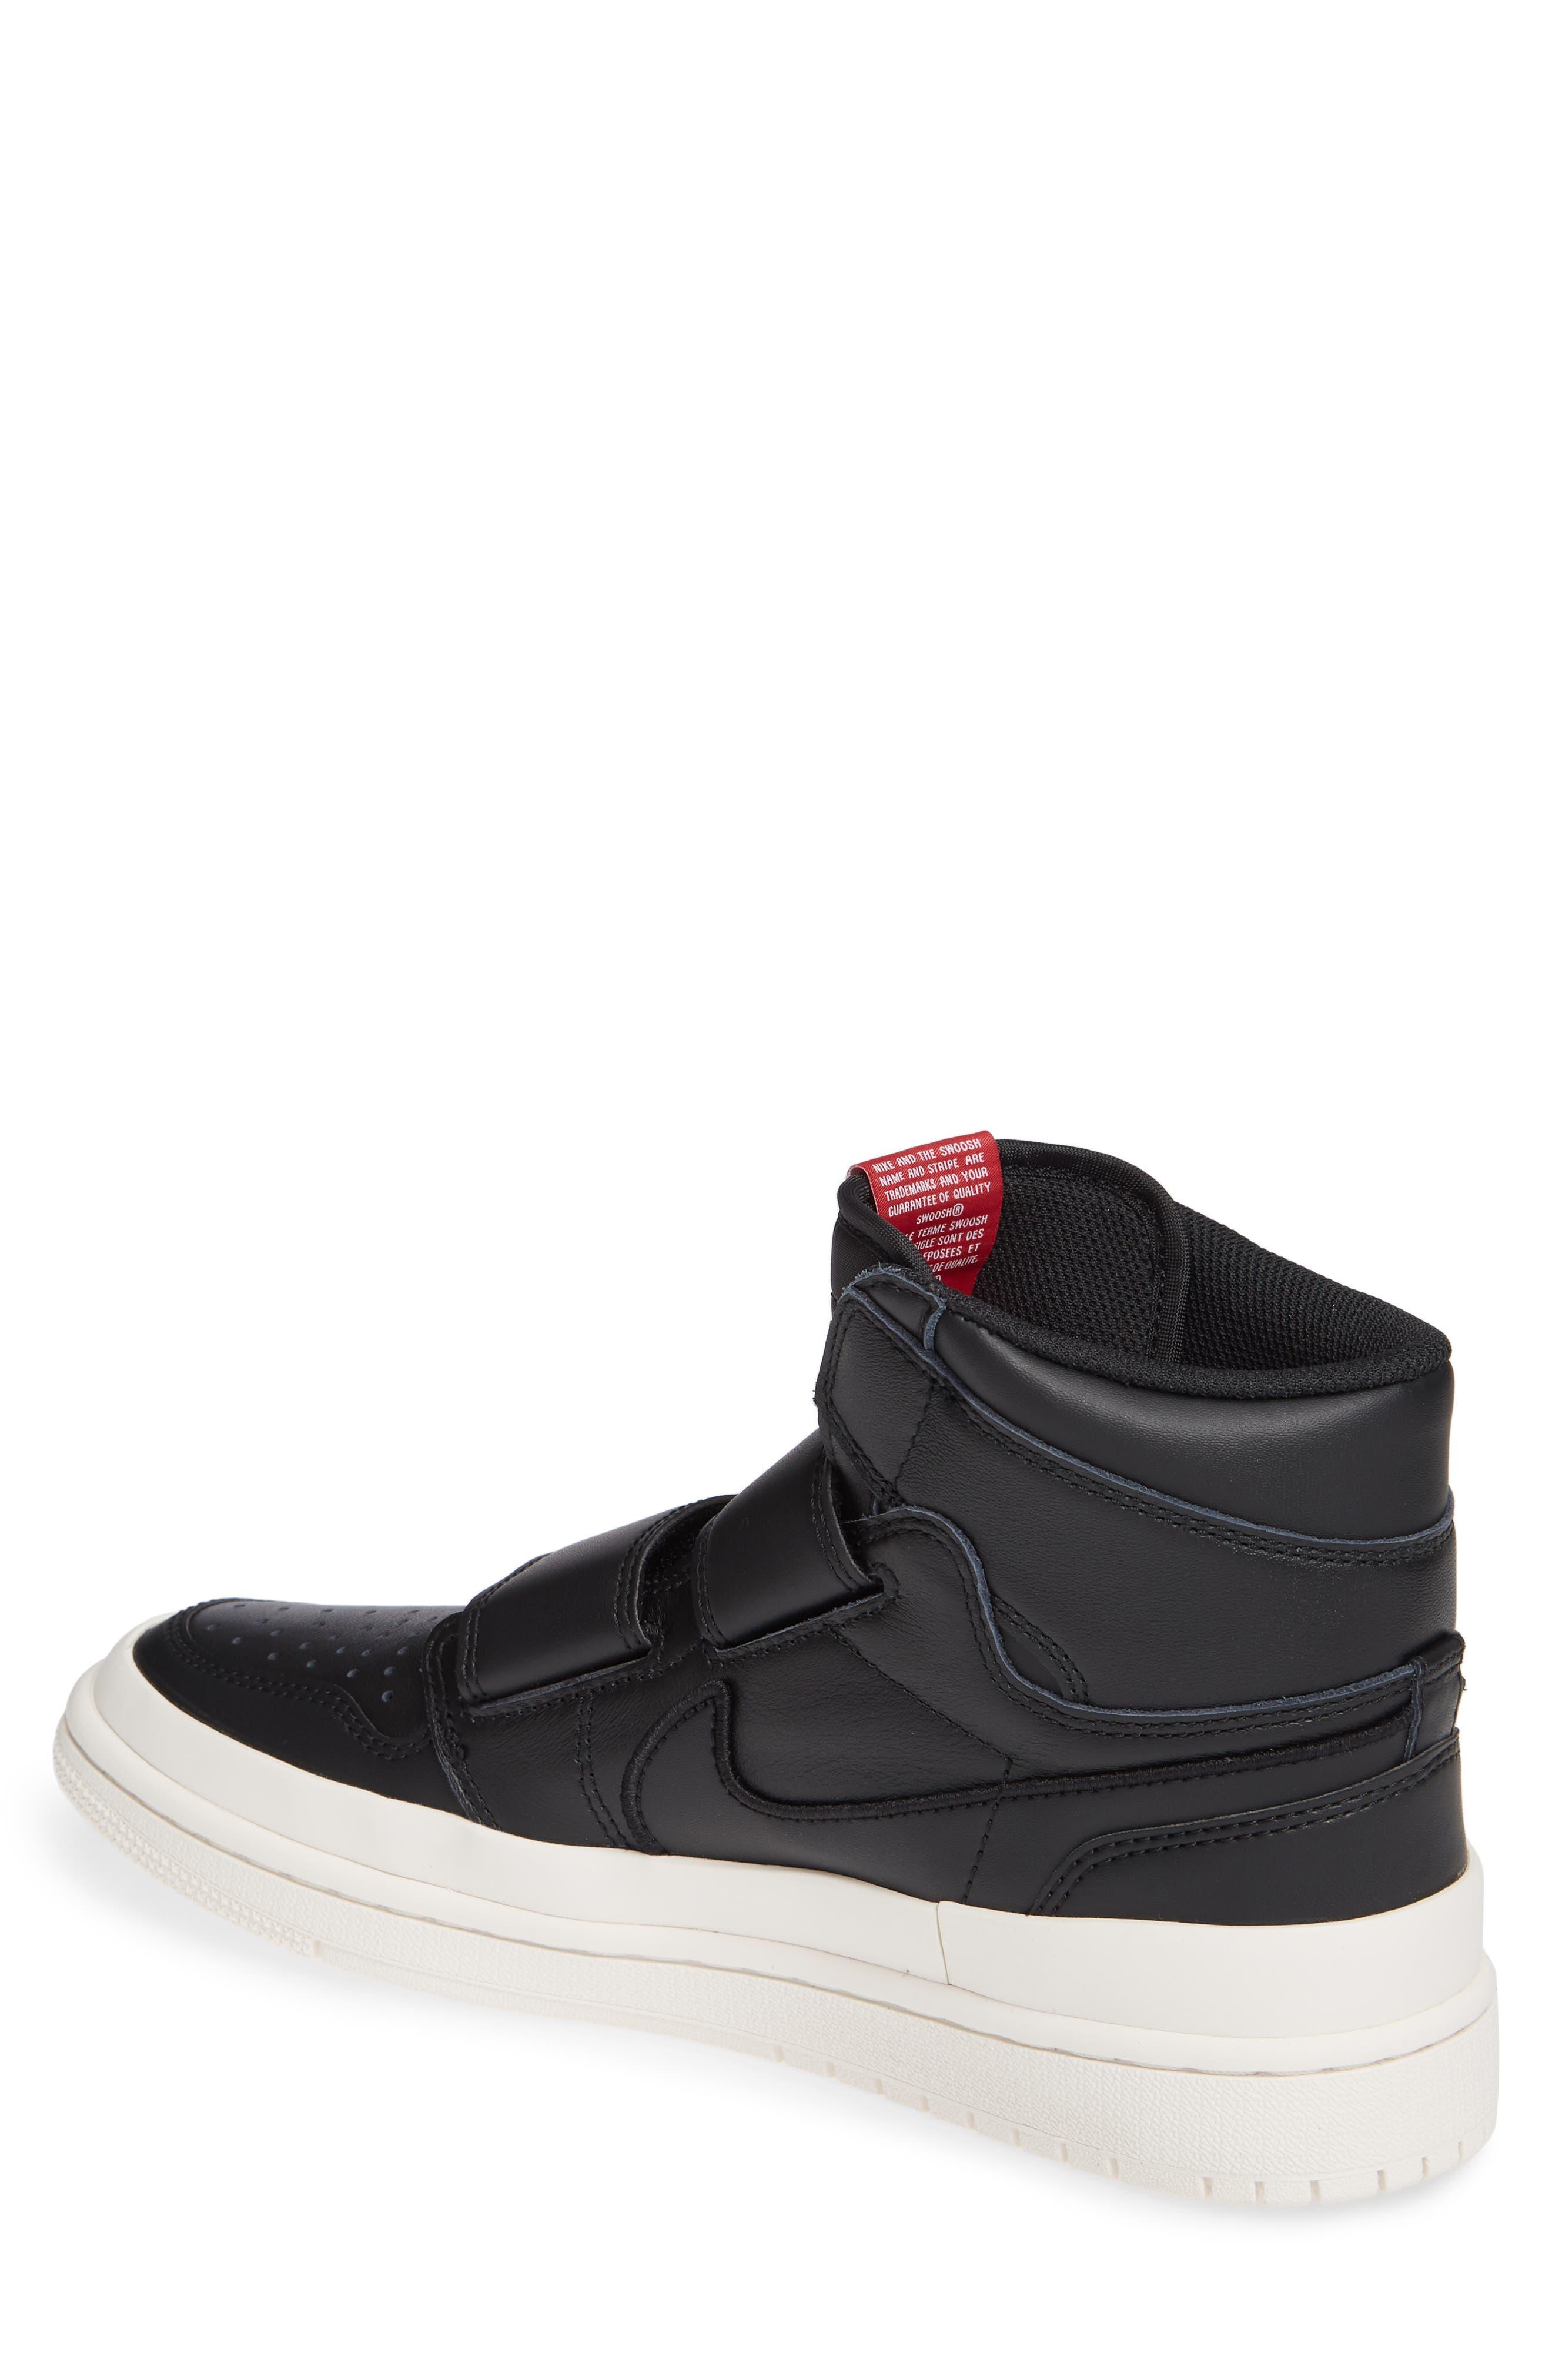 Air Jordan 1 Retro High Double Strap Sneaker,                             Alternate thumbnail 2, color,                             BLACK/ GYM RED